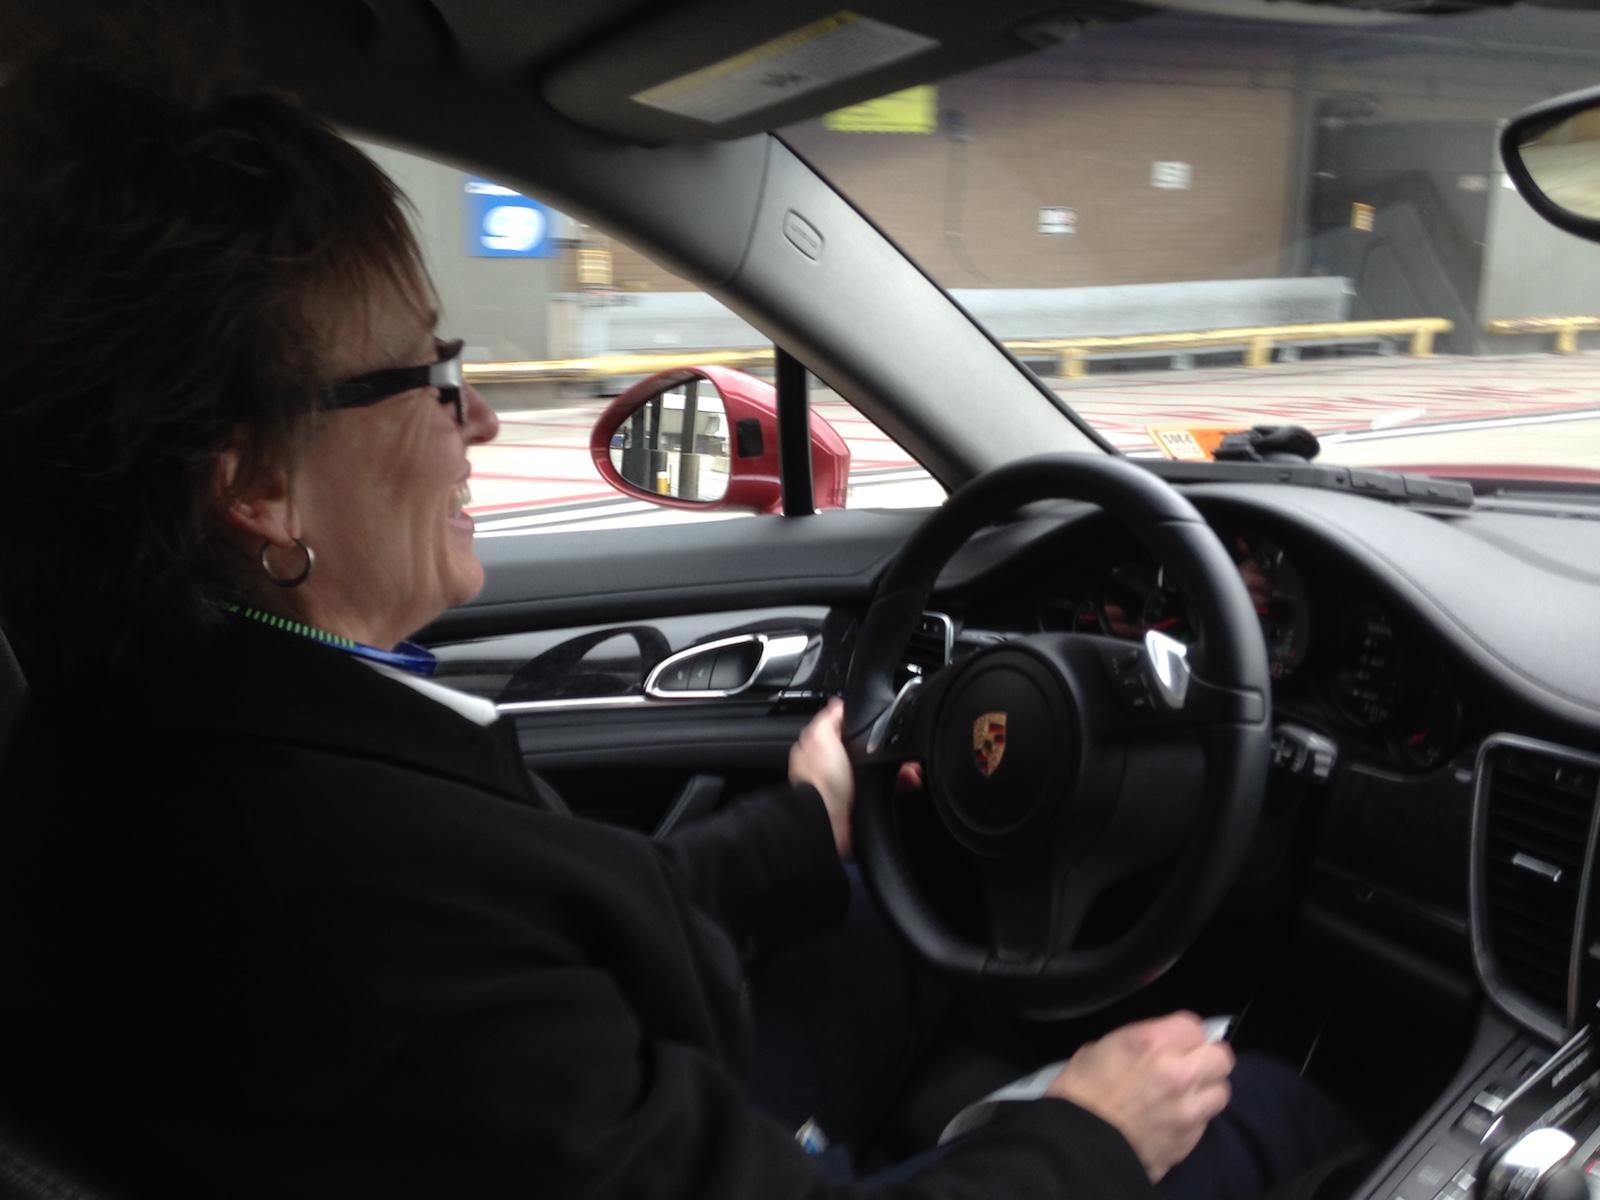 Delta employee extraordinaire Deborah Pratt behind the wheel of a fabulously gorgeous Porsche driving me to my gate so I don't miss my flight to Bozeman.